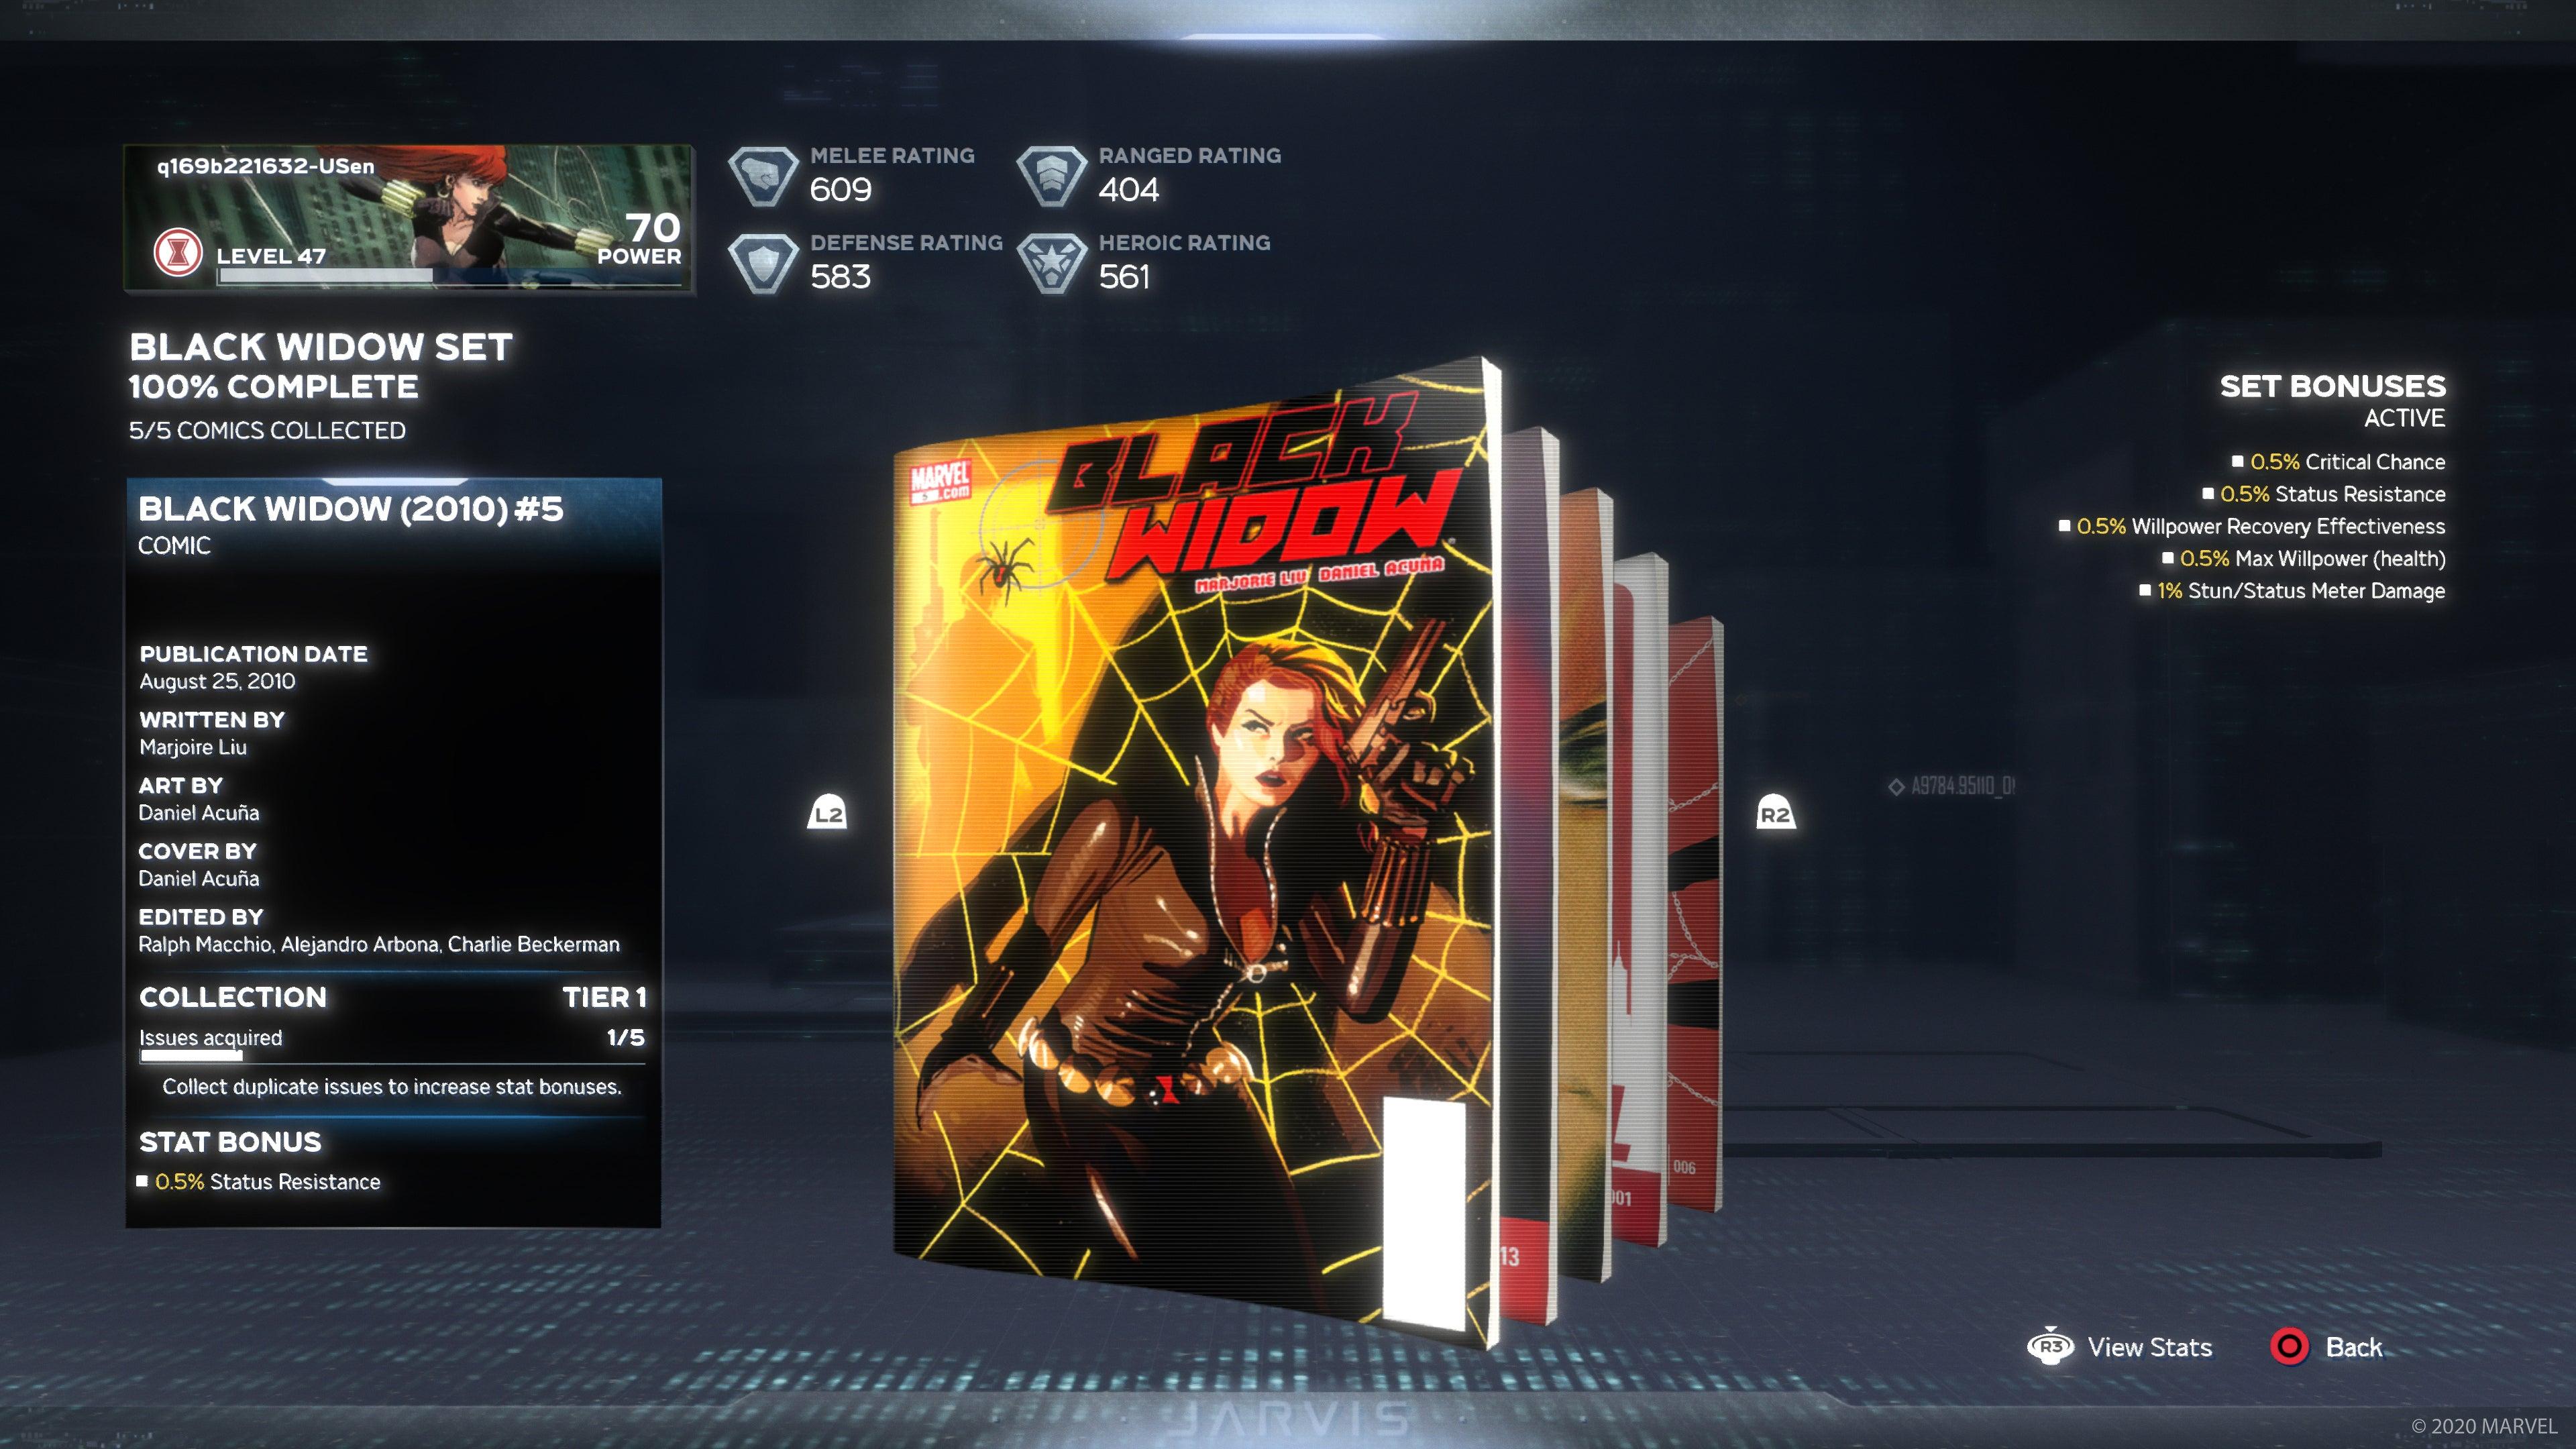 Weekly First Completion Reward: 2010's Black Widow #5 (0.5% Status Resistance)